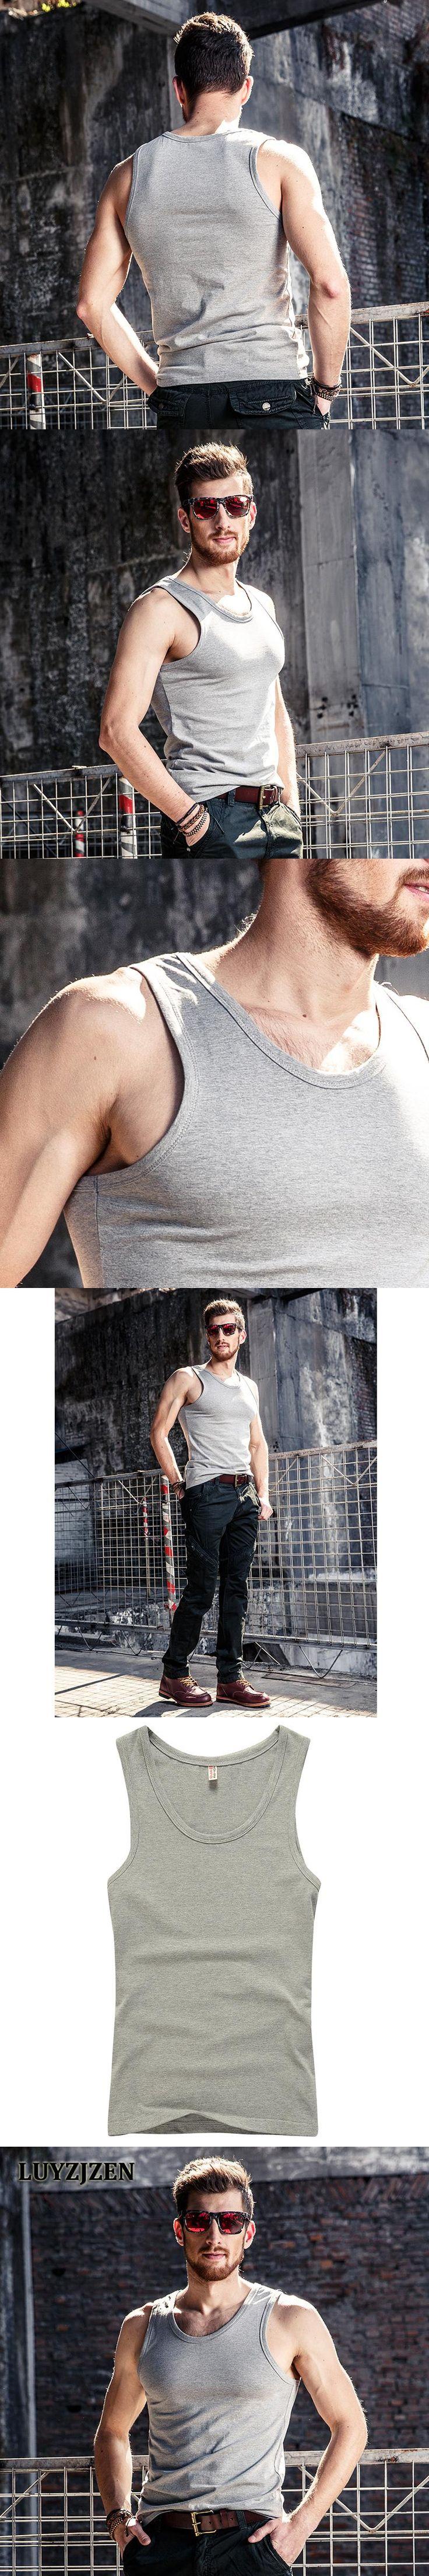 Men's BodybuildingTankTops Sleeveless Singlet and Undershirt Summer Men Fitness Singlets Big Muscle T-shirts Cotton Vest 19